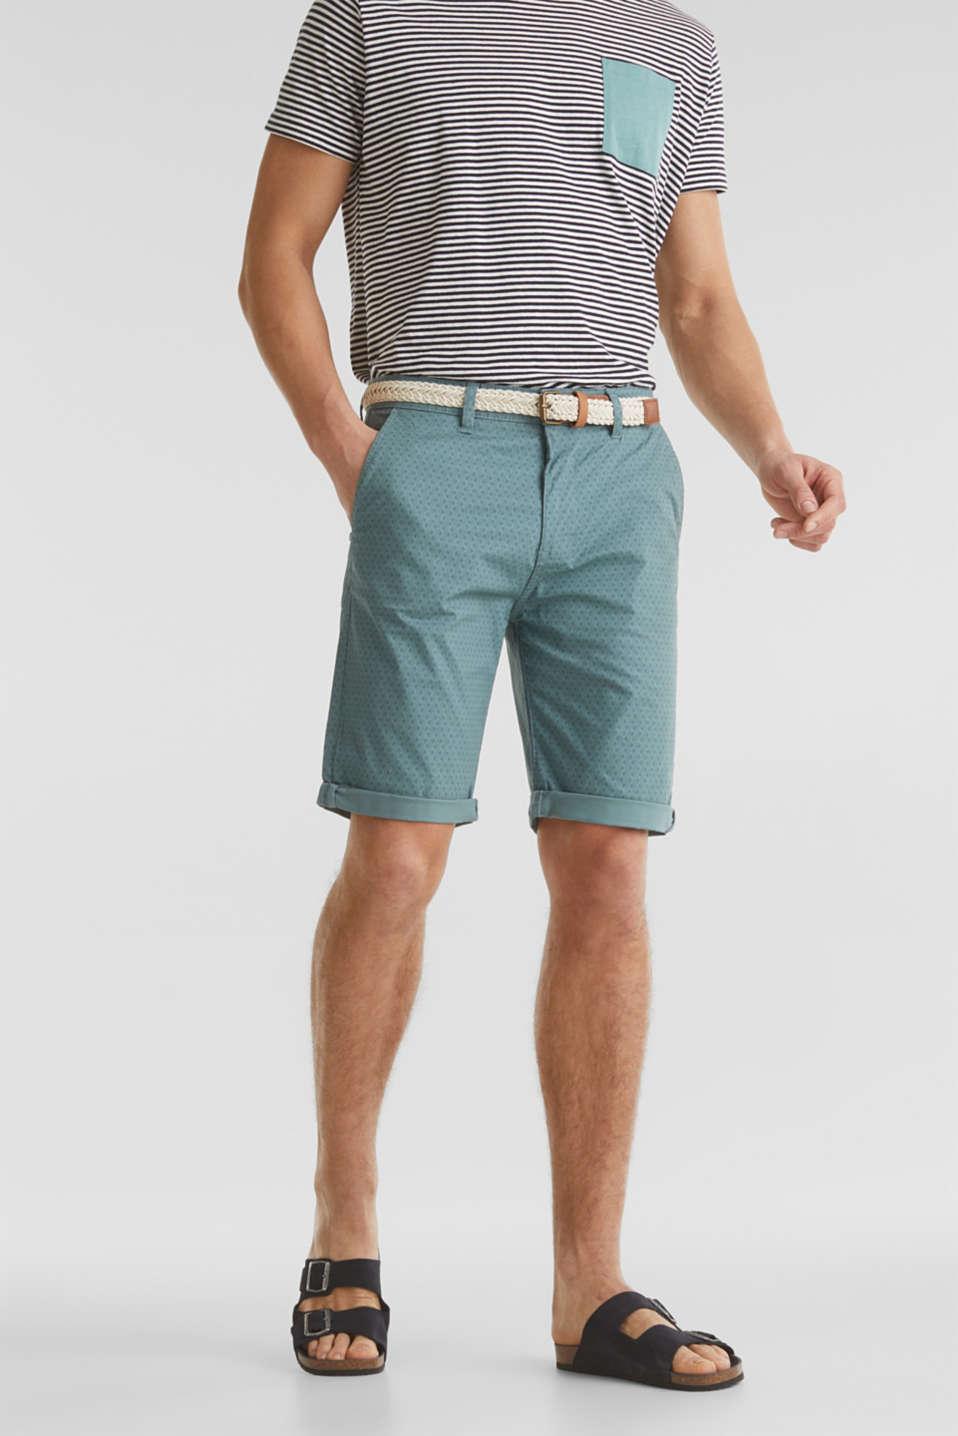 Organic cotton Shorts + belt, TEAL GREEN, detail image number 0